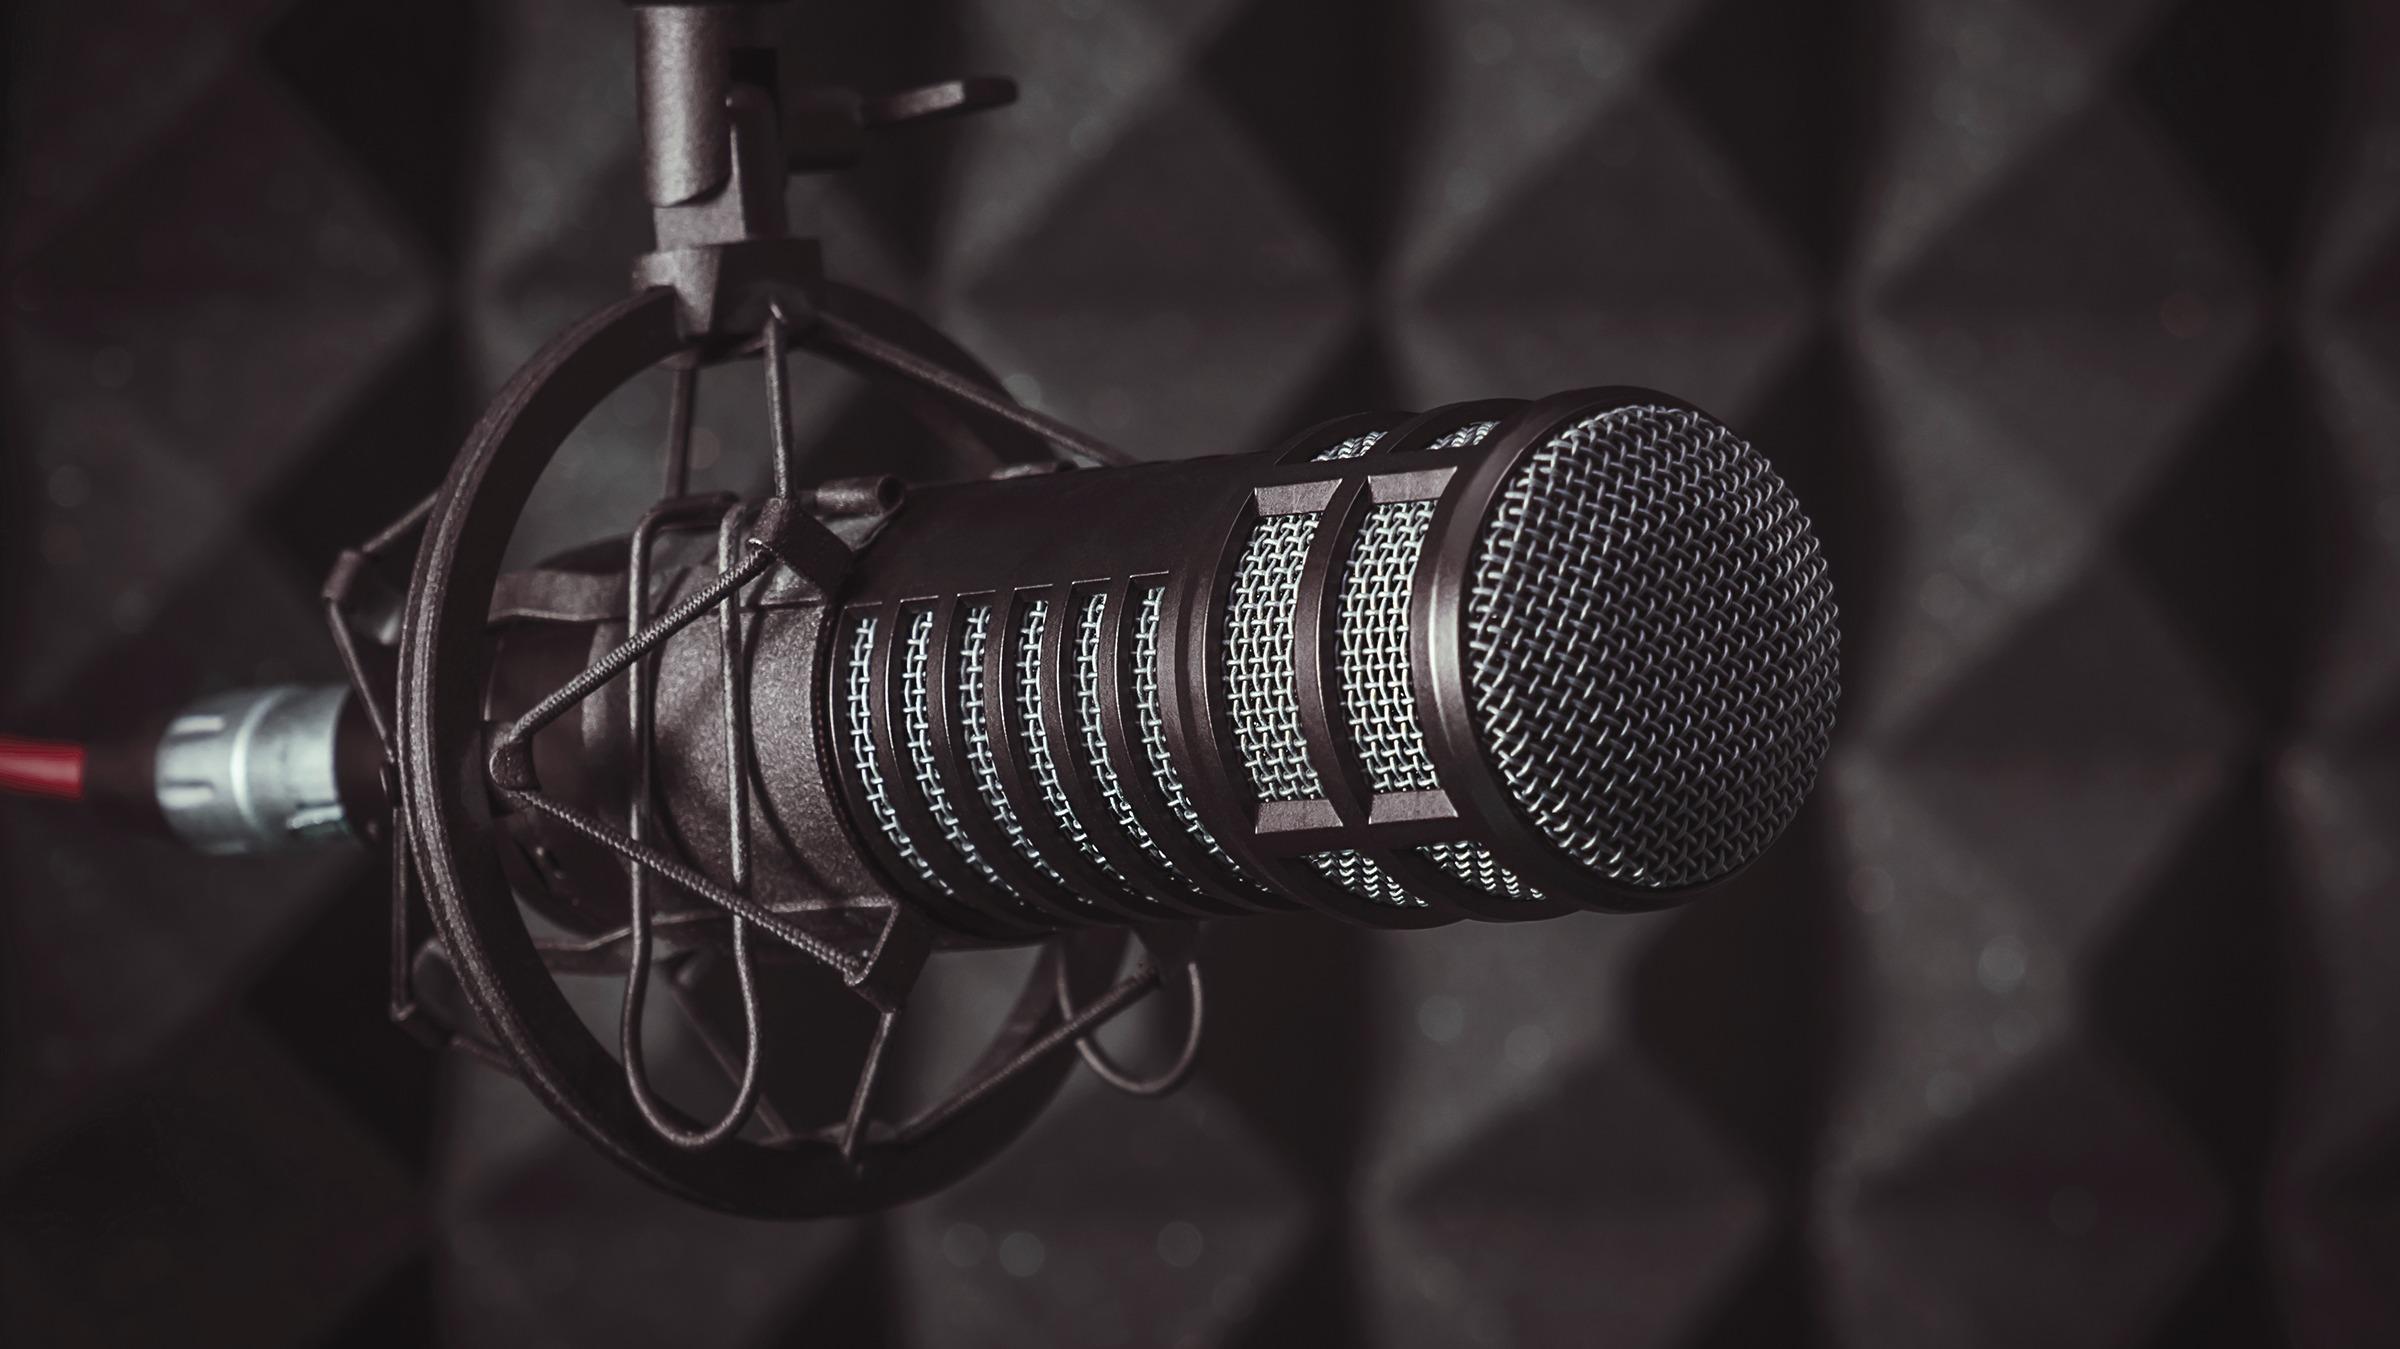 Qmusic teaser qpodcast